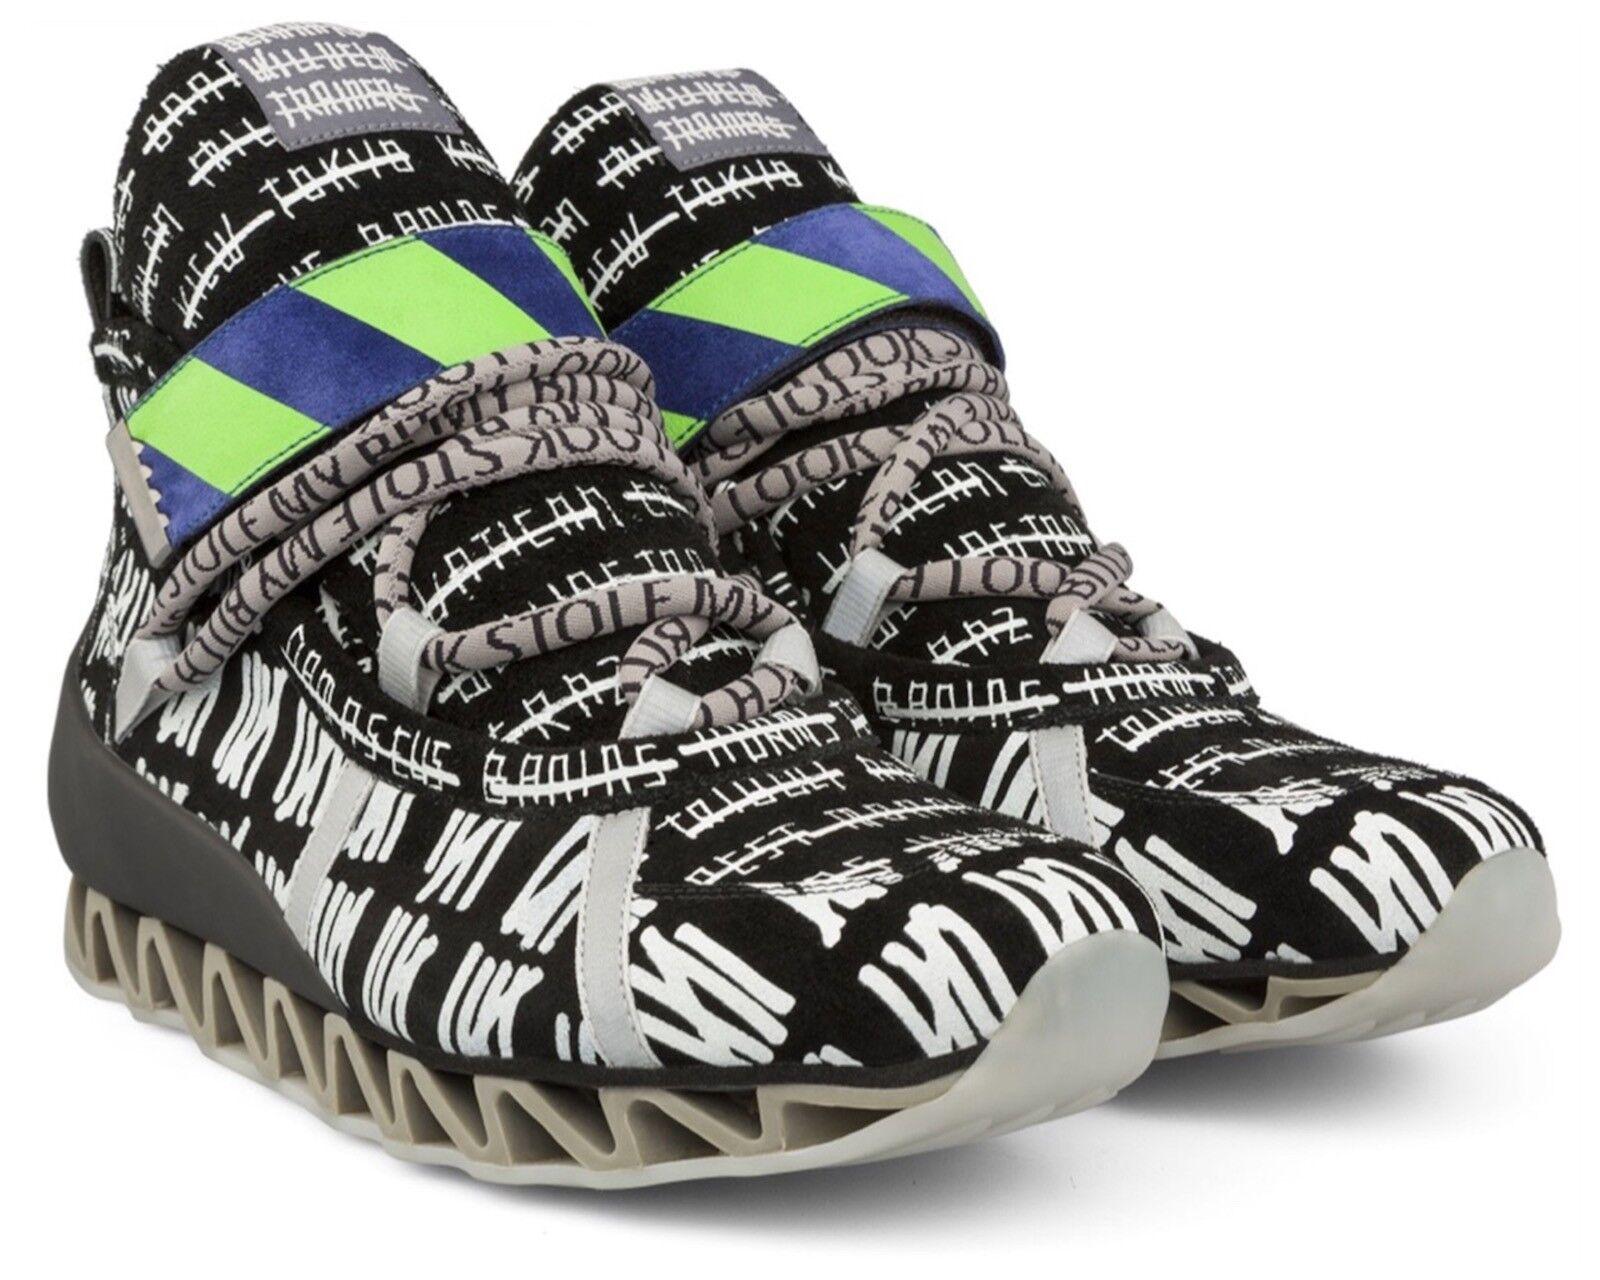 320 Bernhard Willhelm X Camper US 9 9 9 EU 42 Together Himalayan Sneakers 36514-023 89b1ec